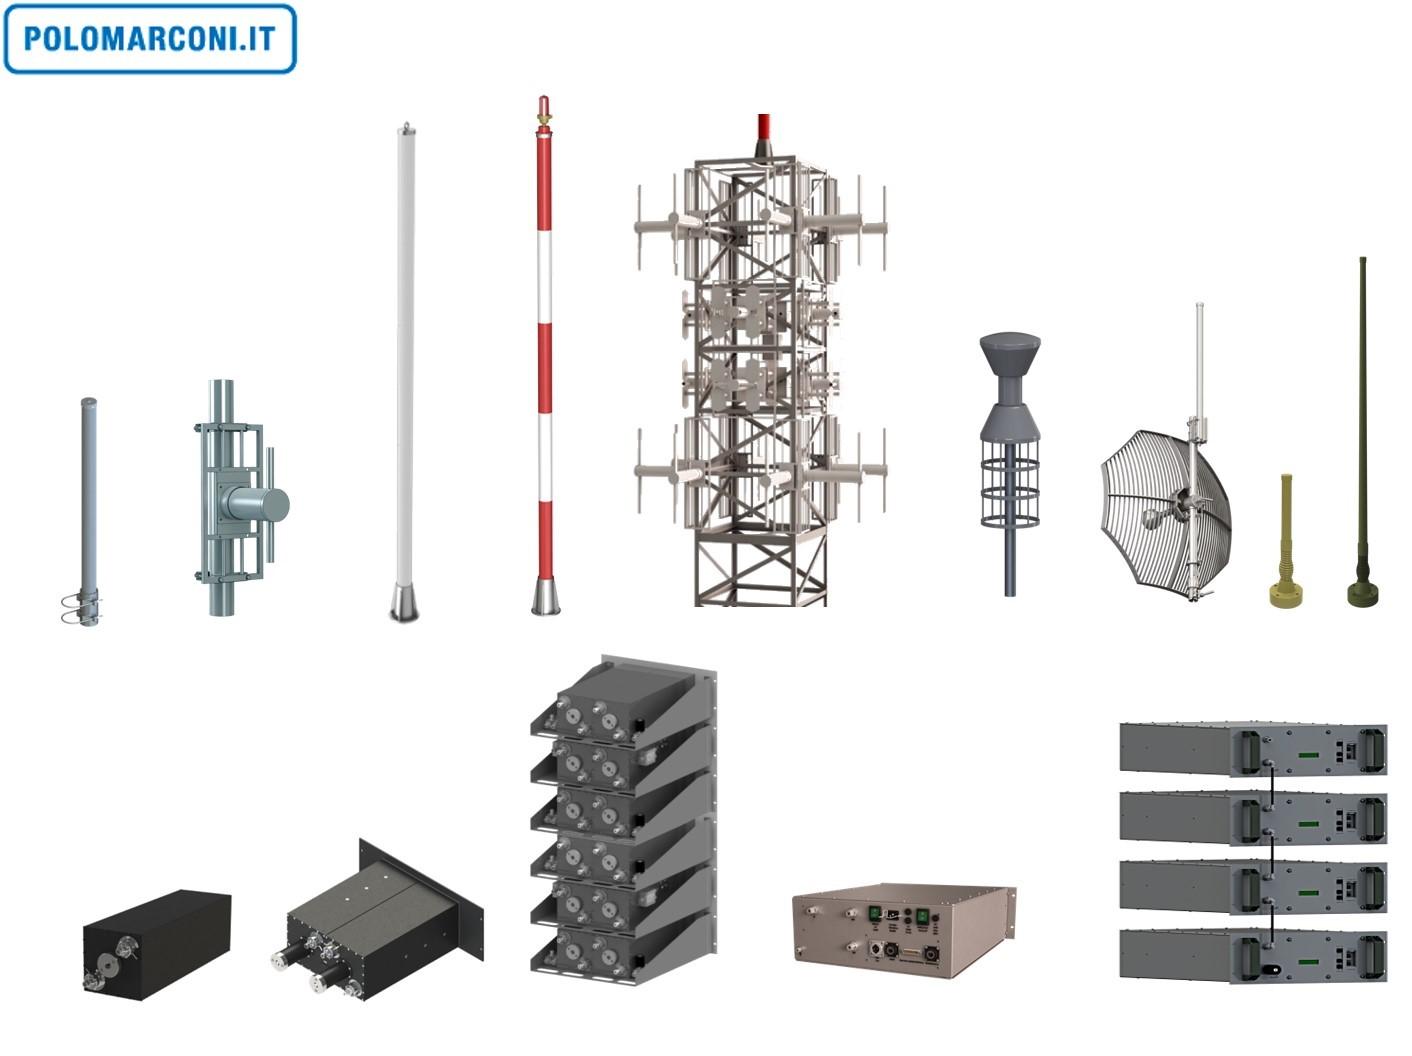 POLOMARCONI ANTENAS Y FILTROS VHF-UHF